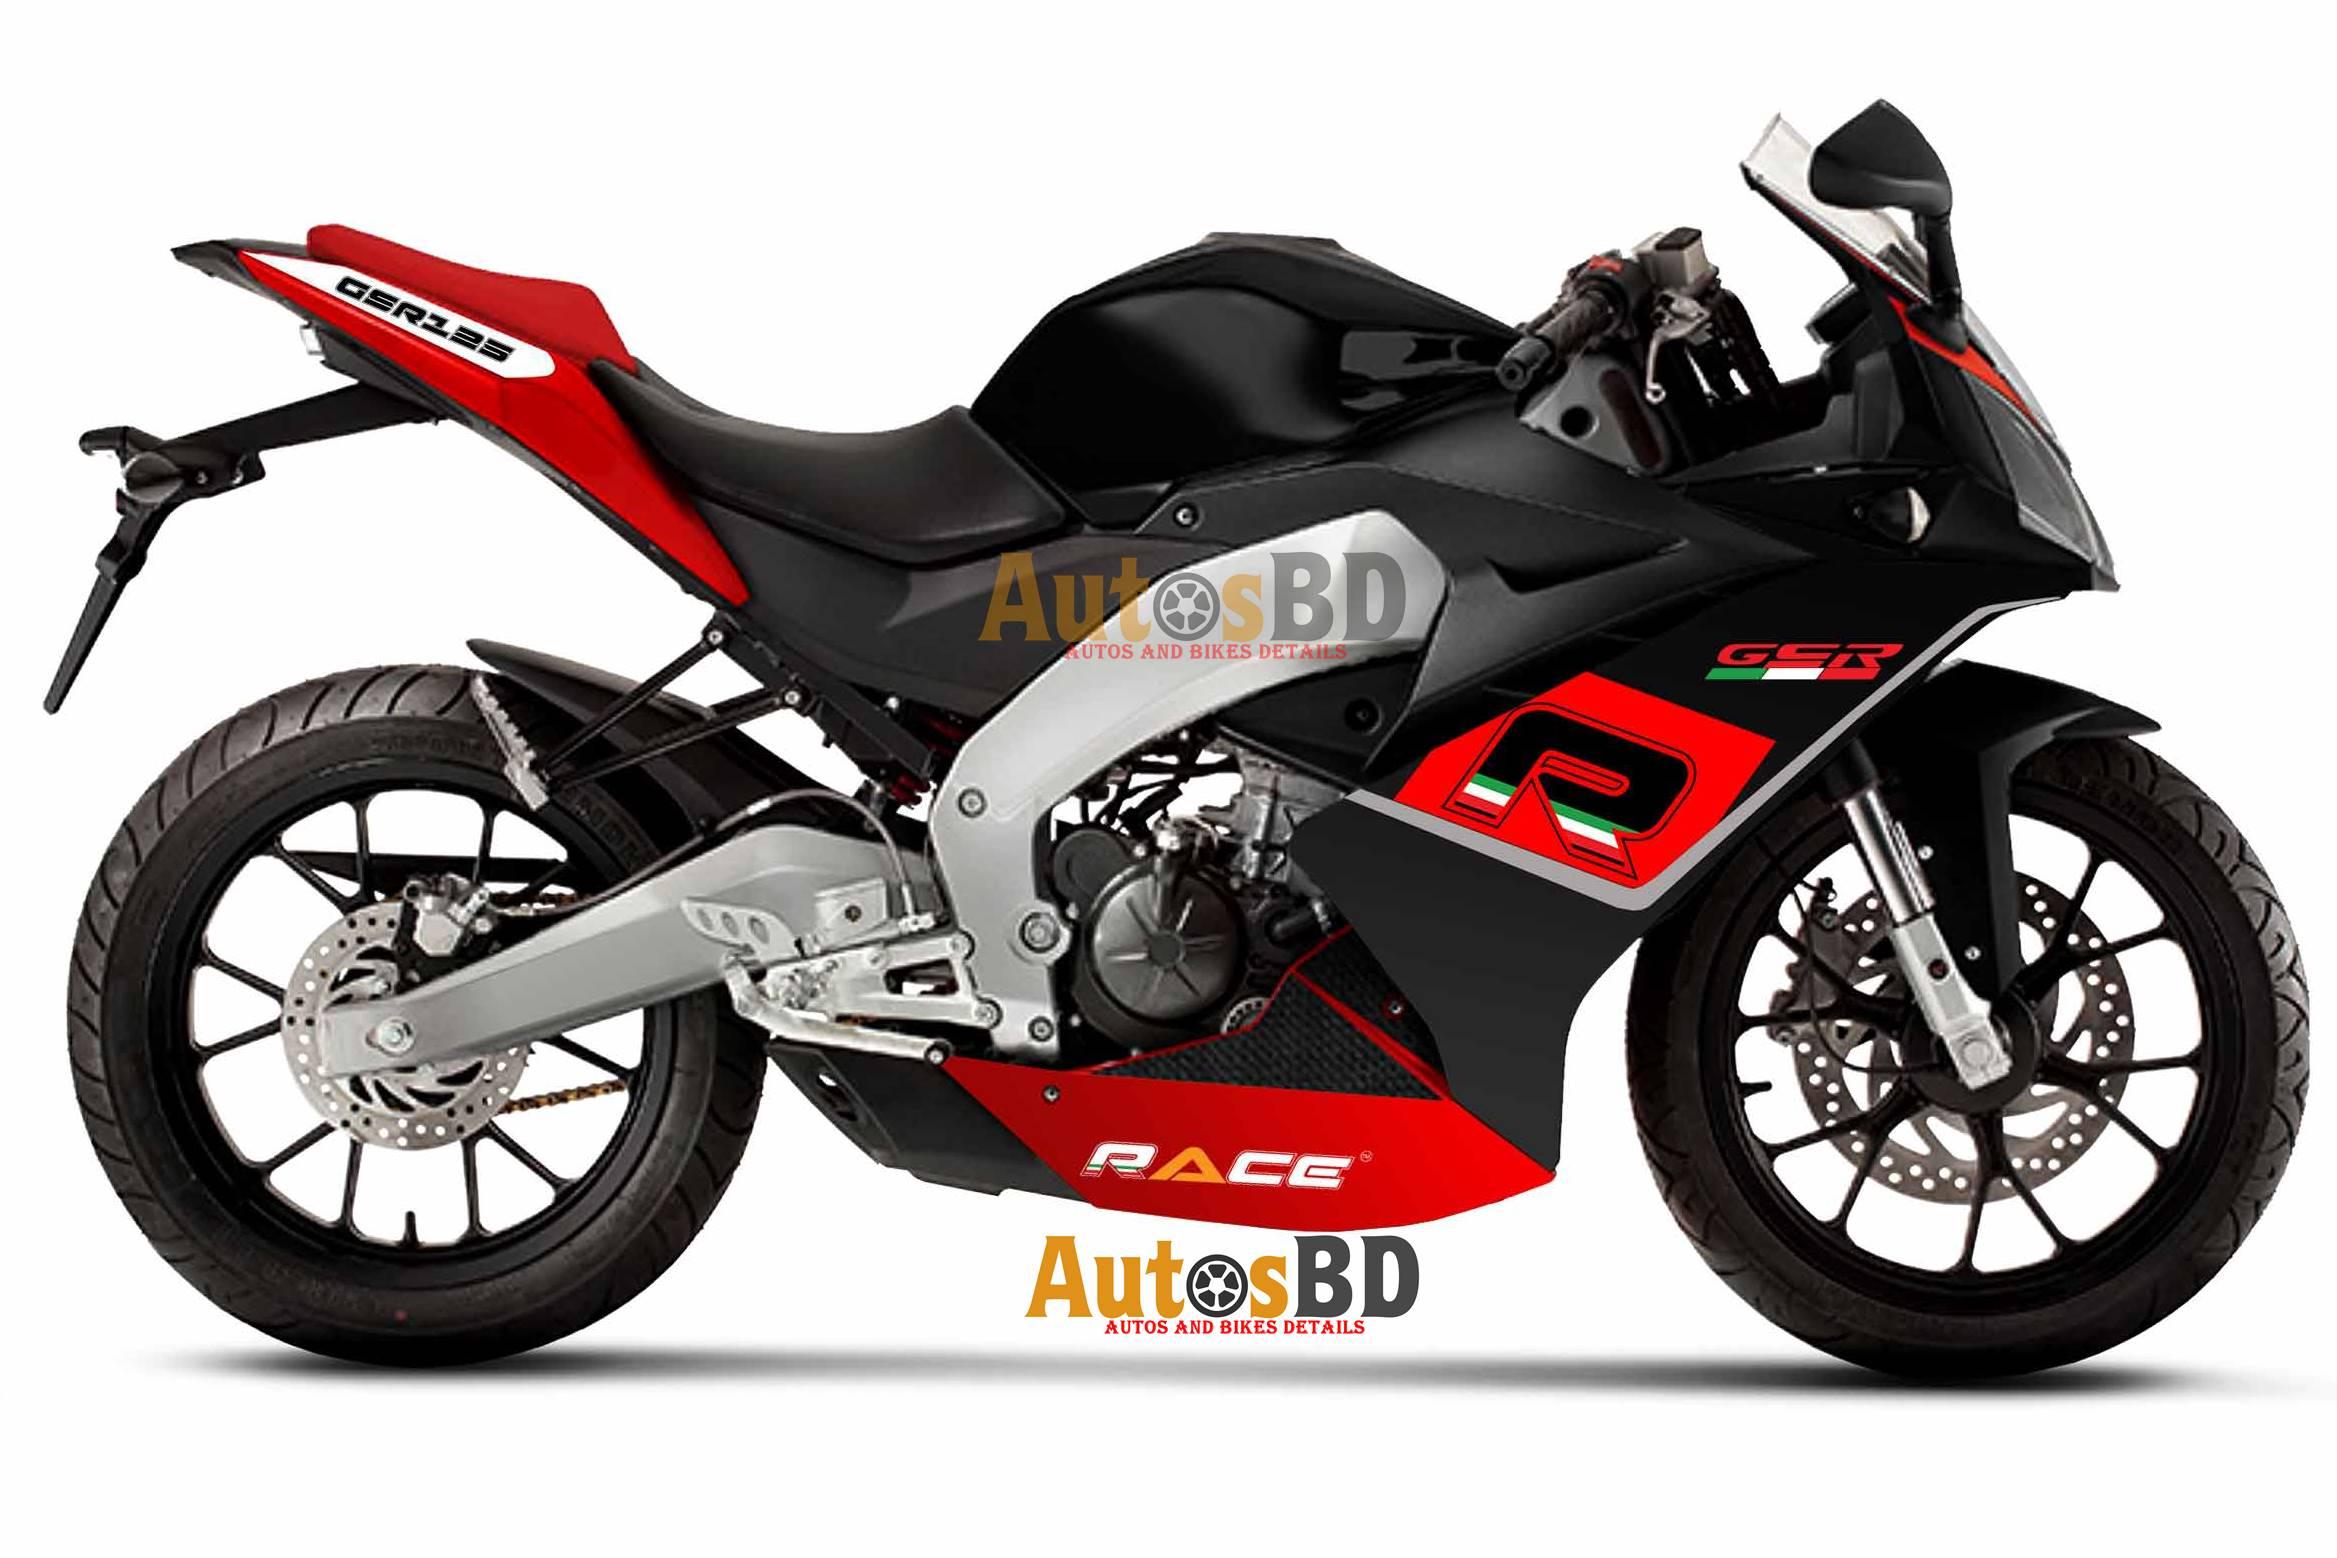 Race GSR125 Motorcycle Price in Bangladesh